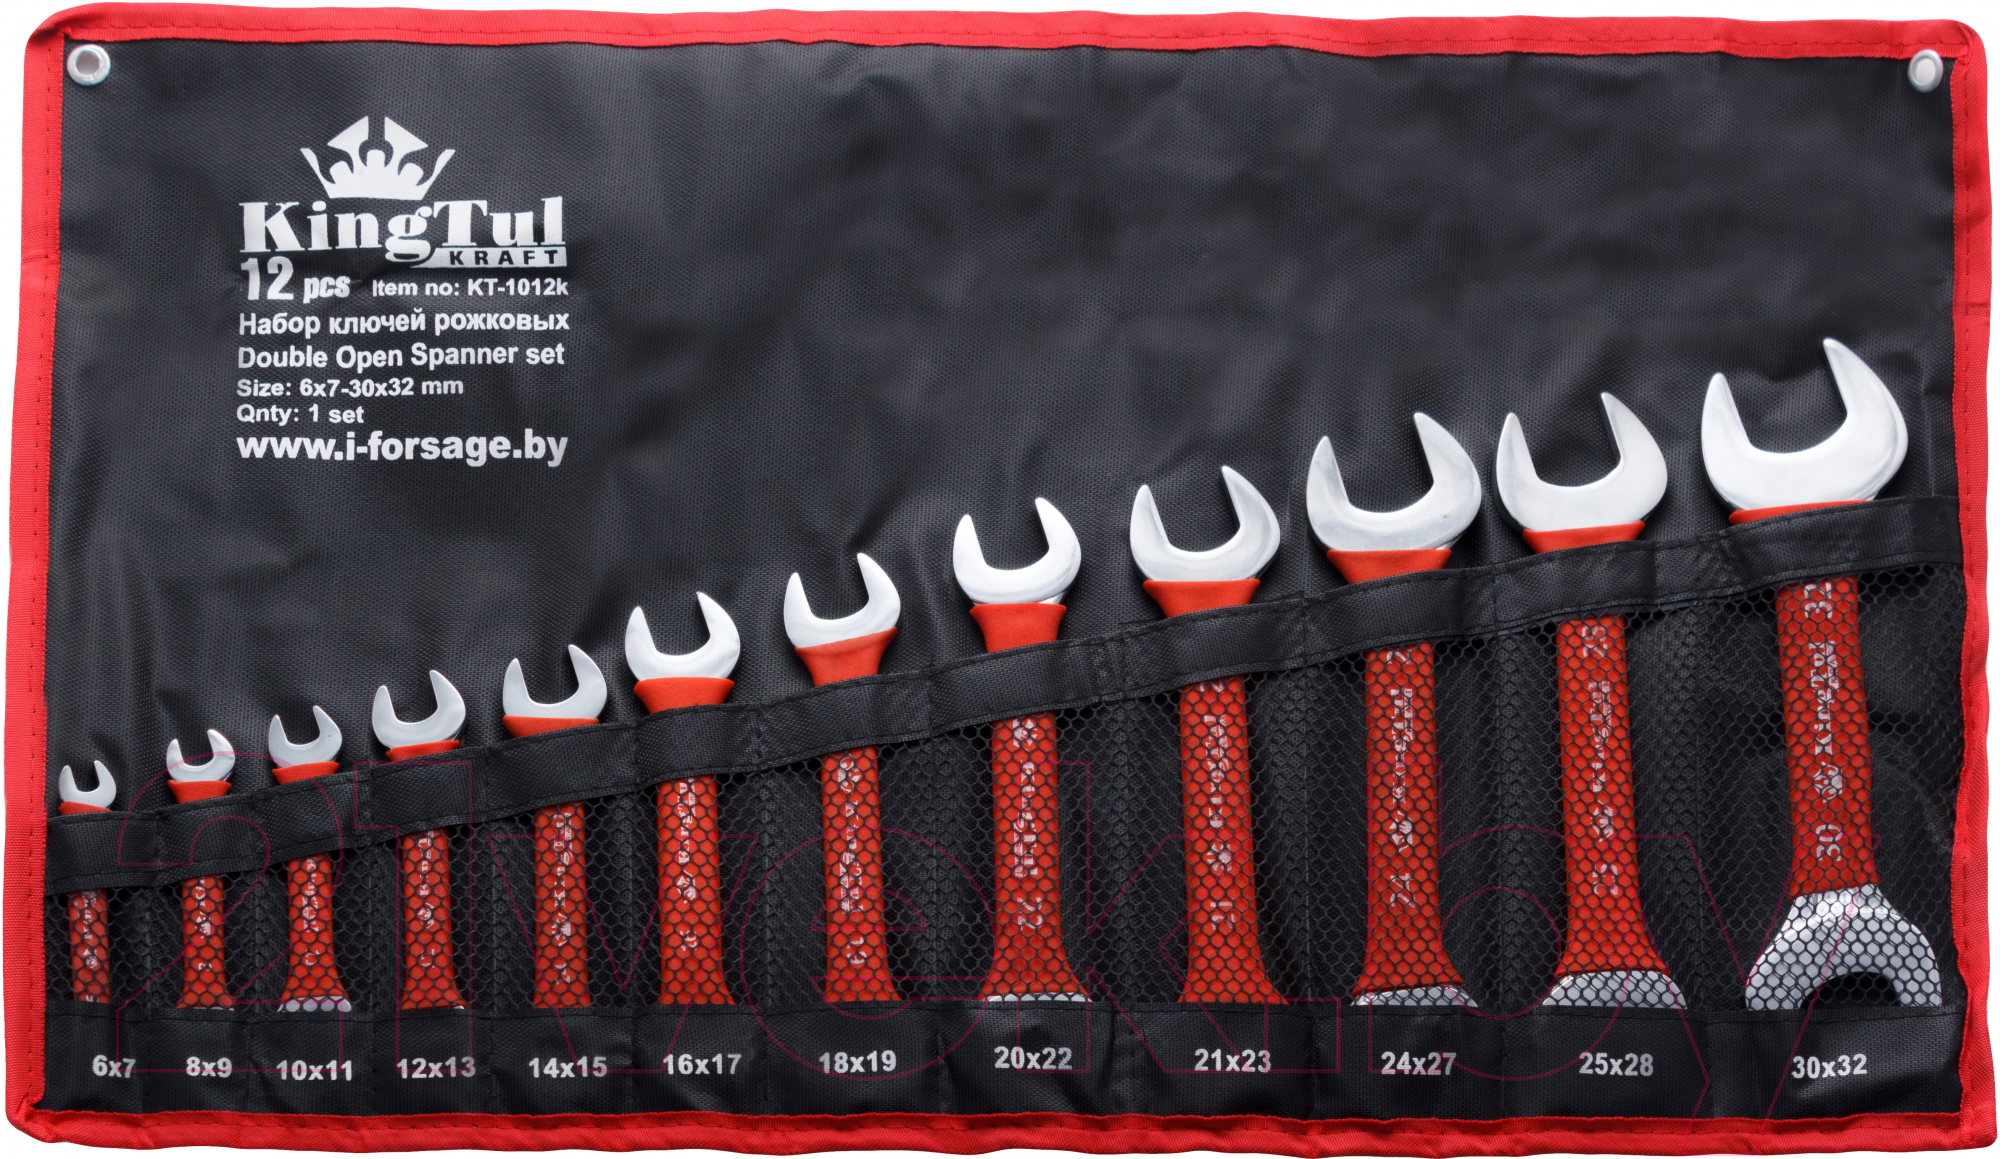 Купить Набор ключей KingTul, KT-1012k(3212K), Китай